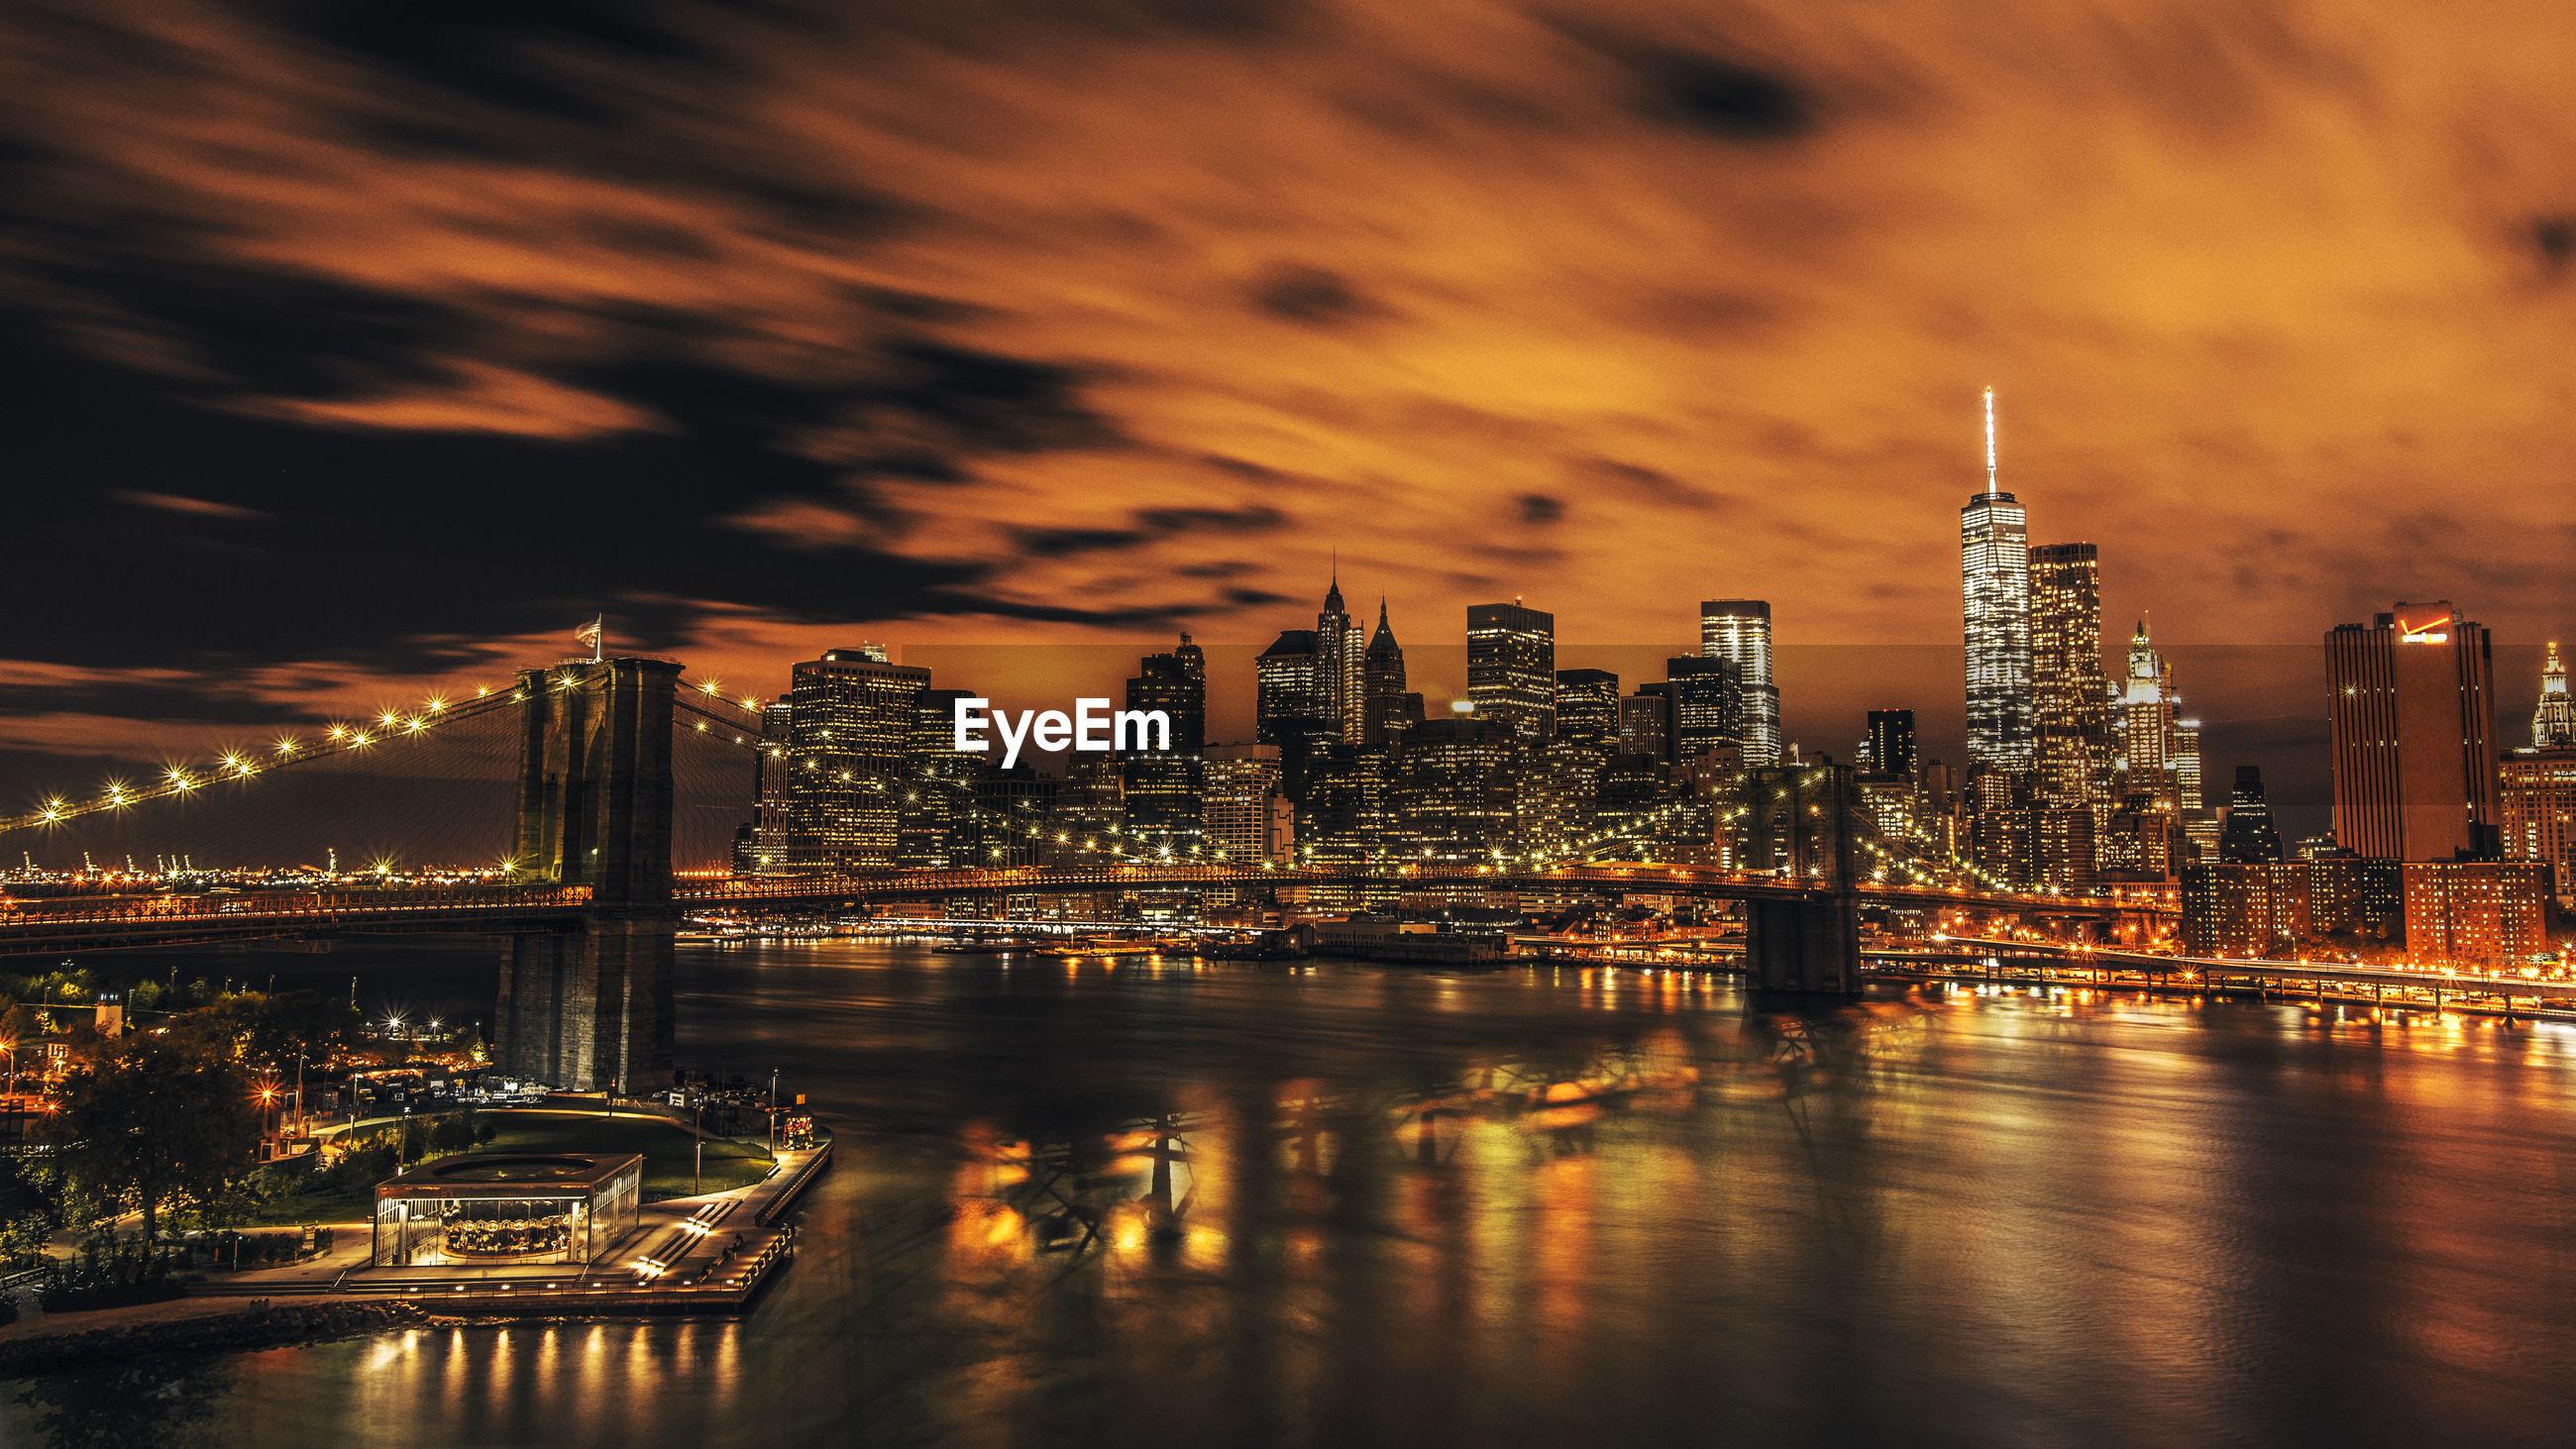 City lit up at dusk